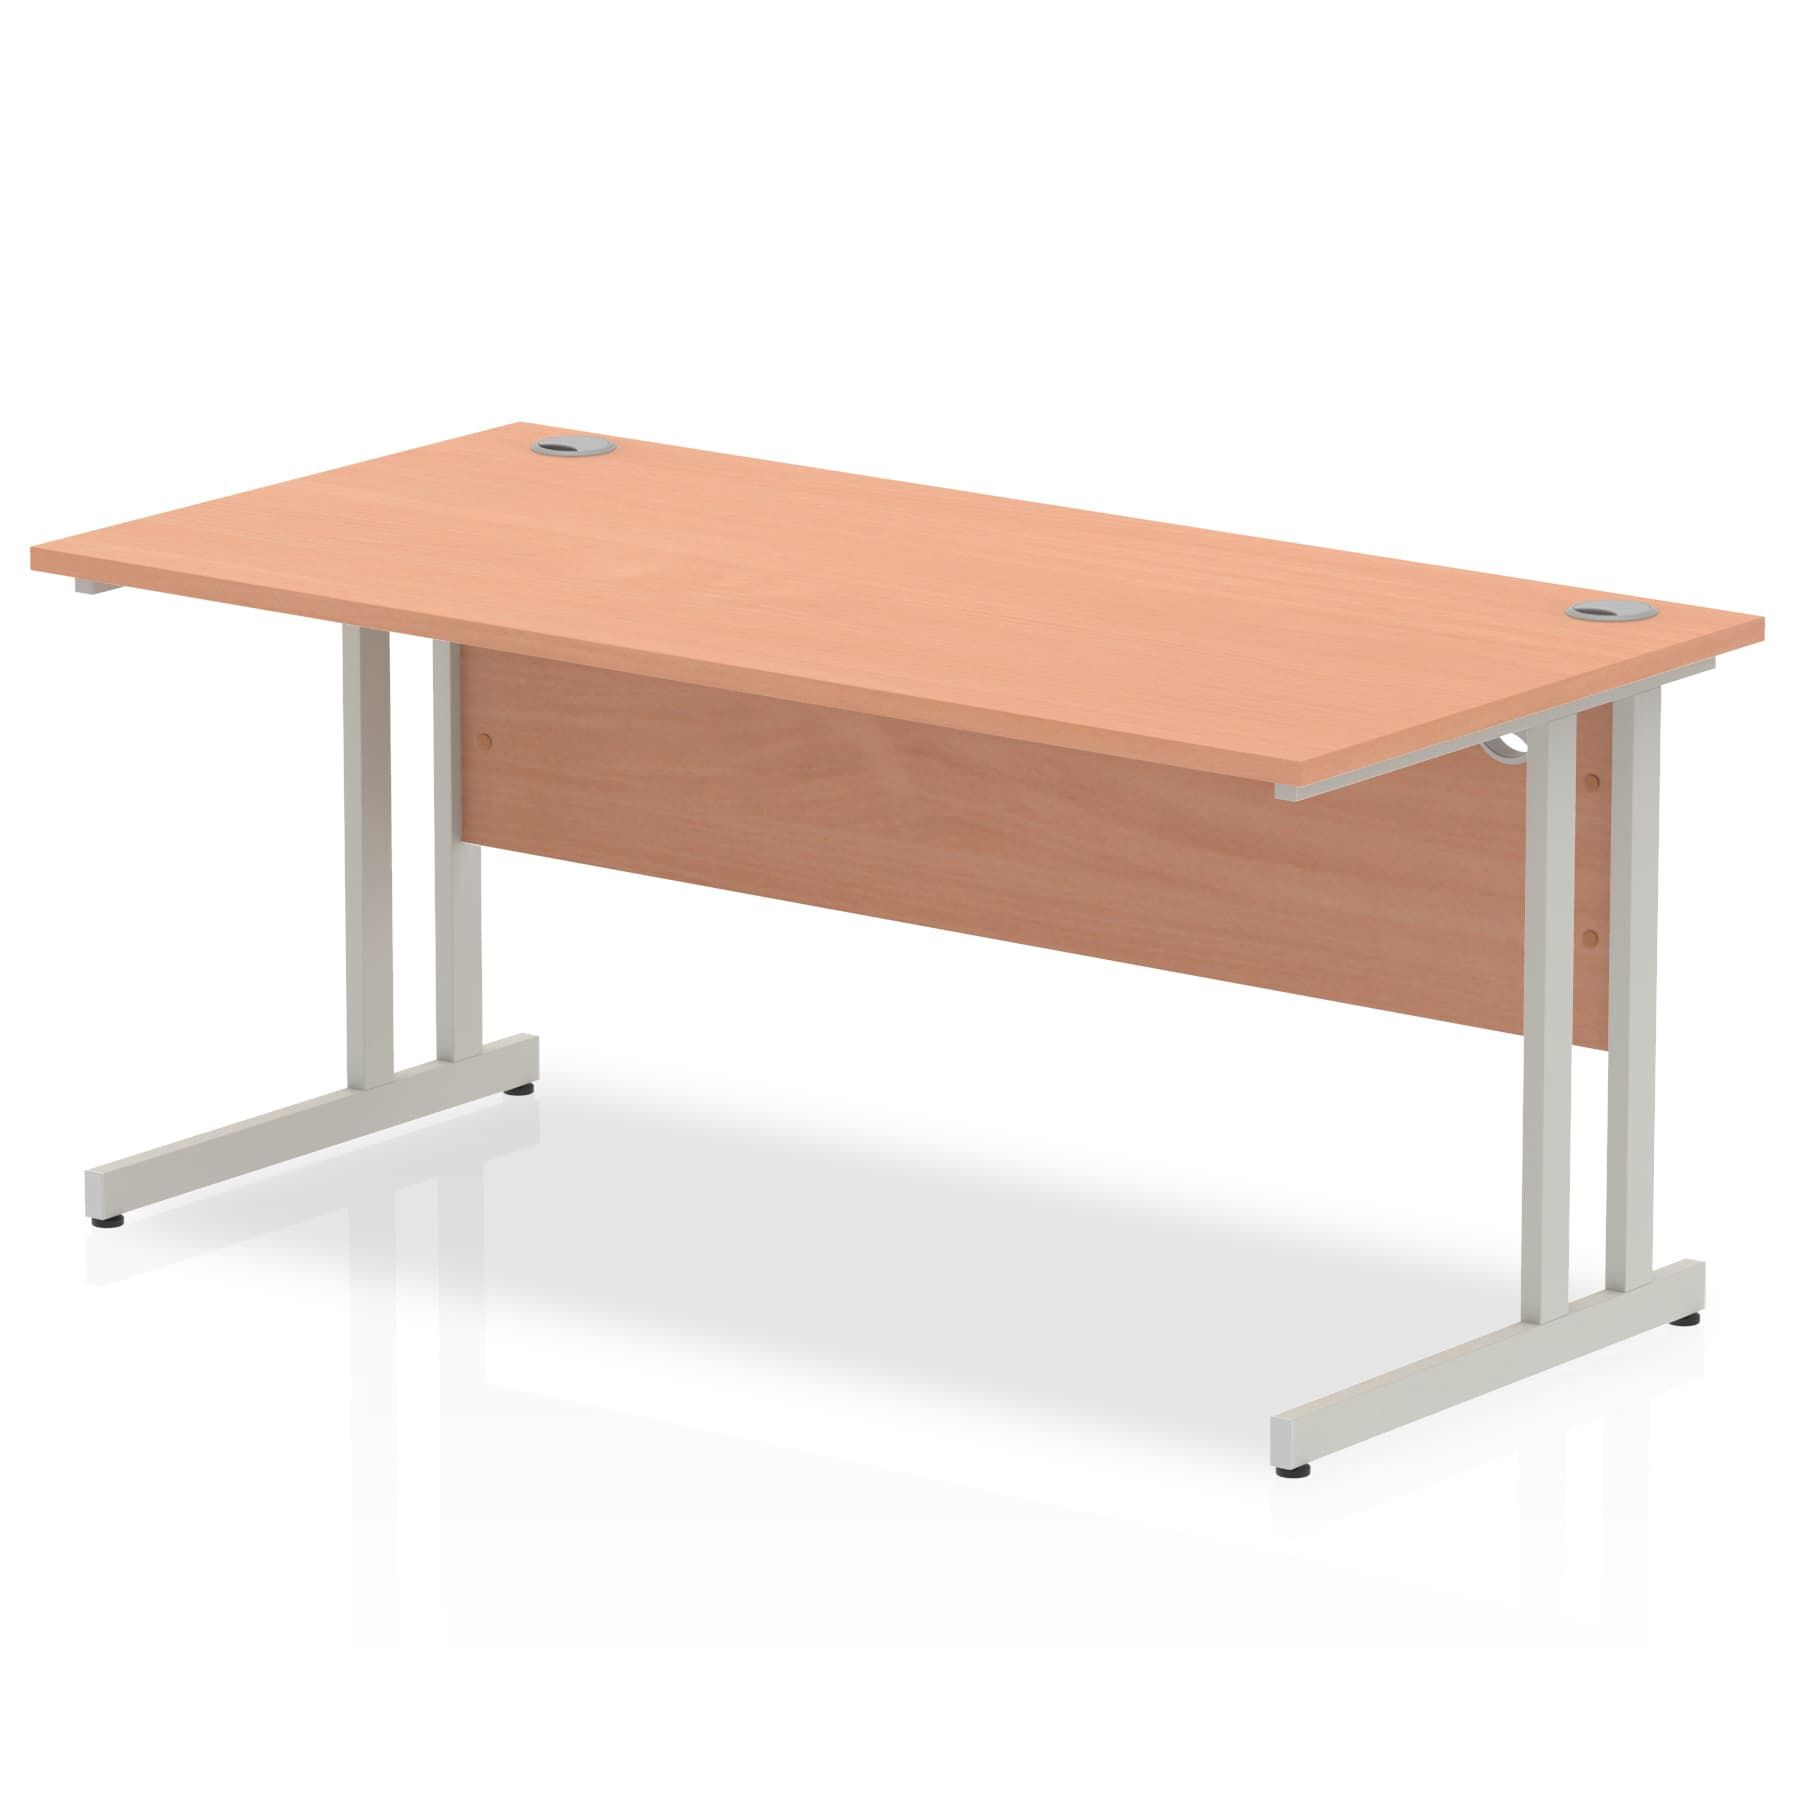 Impulse Cantilever 1600 Rectangle Desk